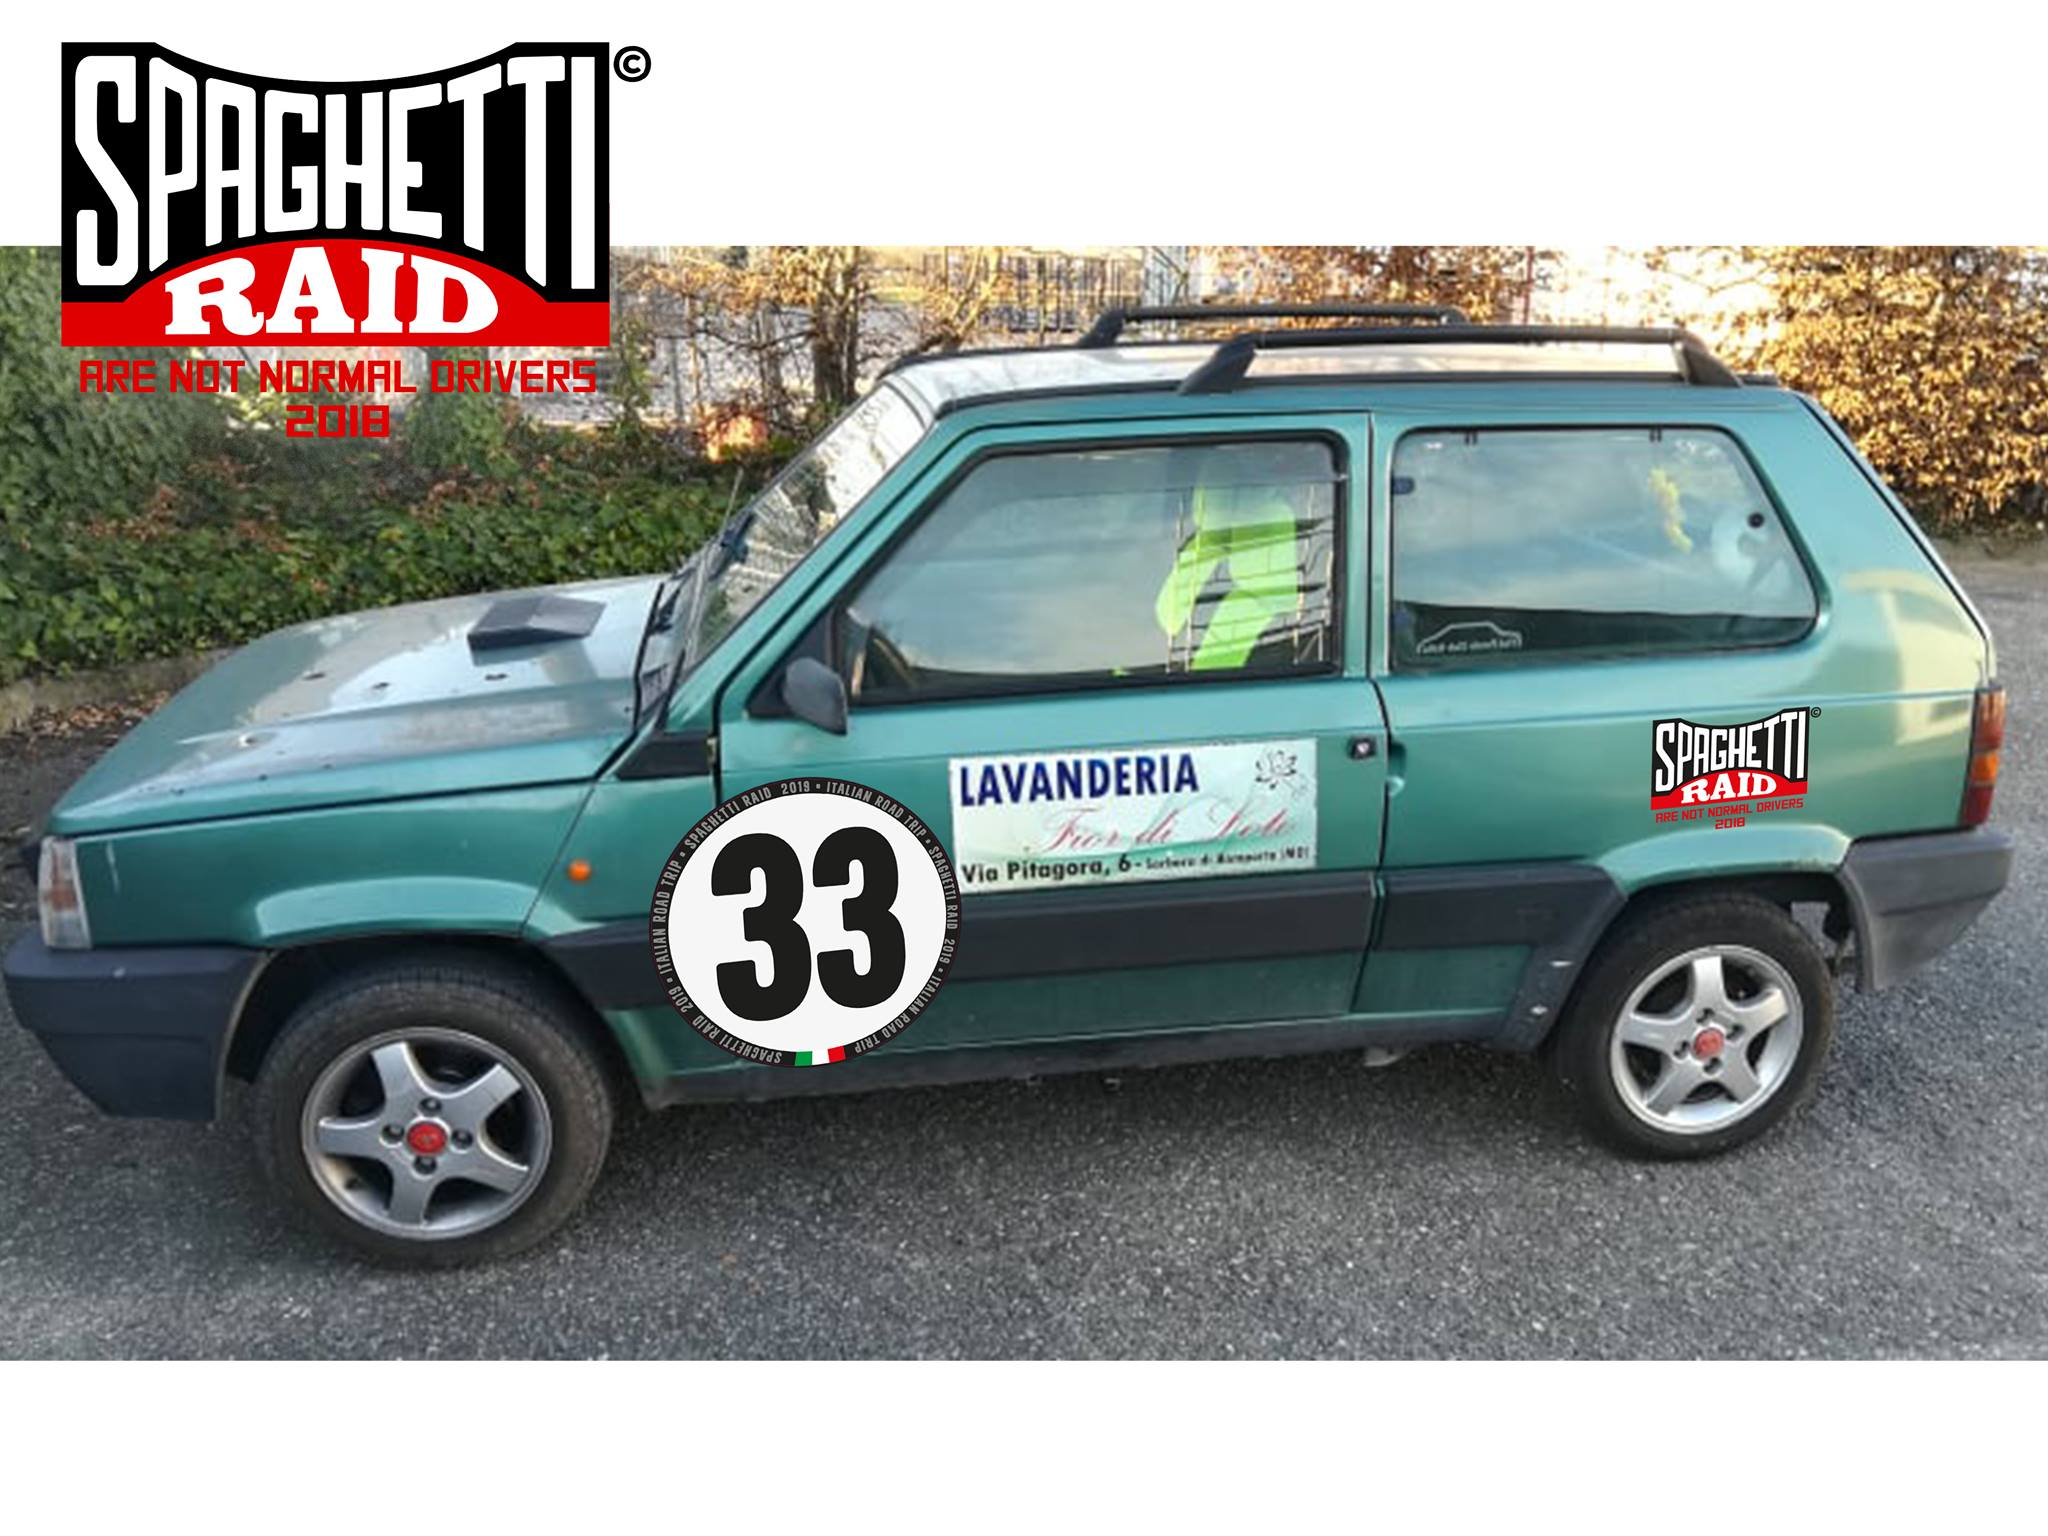 Team FIOR DI LOTO RACING TEAM #33 FIAT PANDA HOBBY 899cc del '99 Città: San Prospero MO